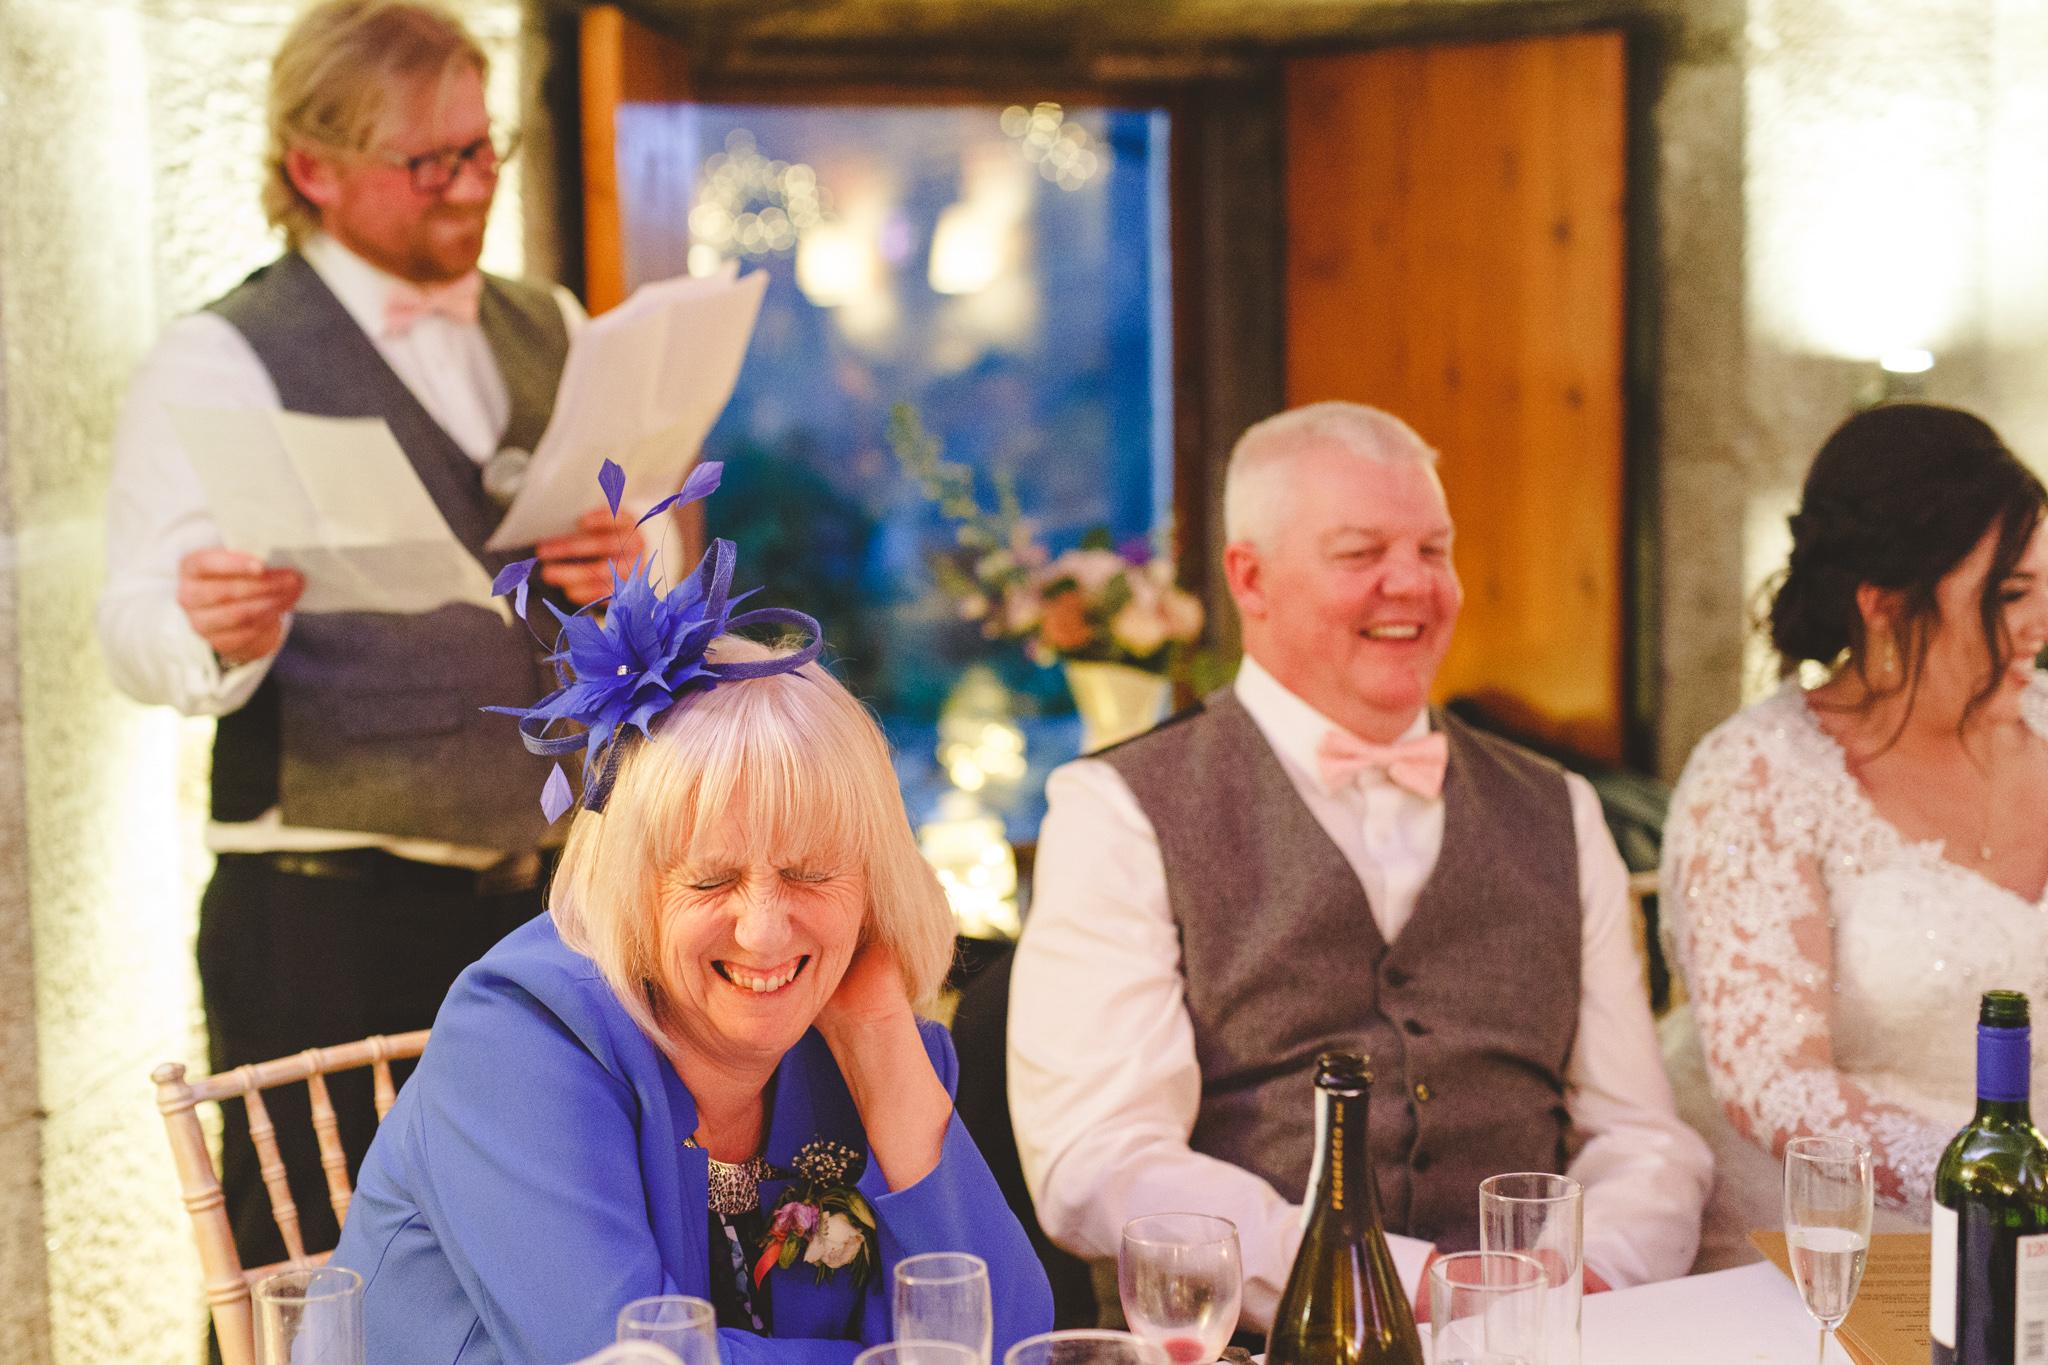 derbyshire-wedding-photographer-march-april-18.jpg